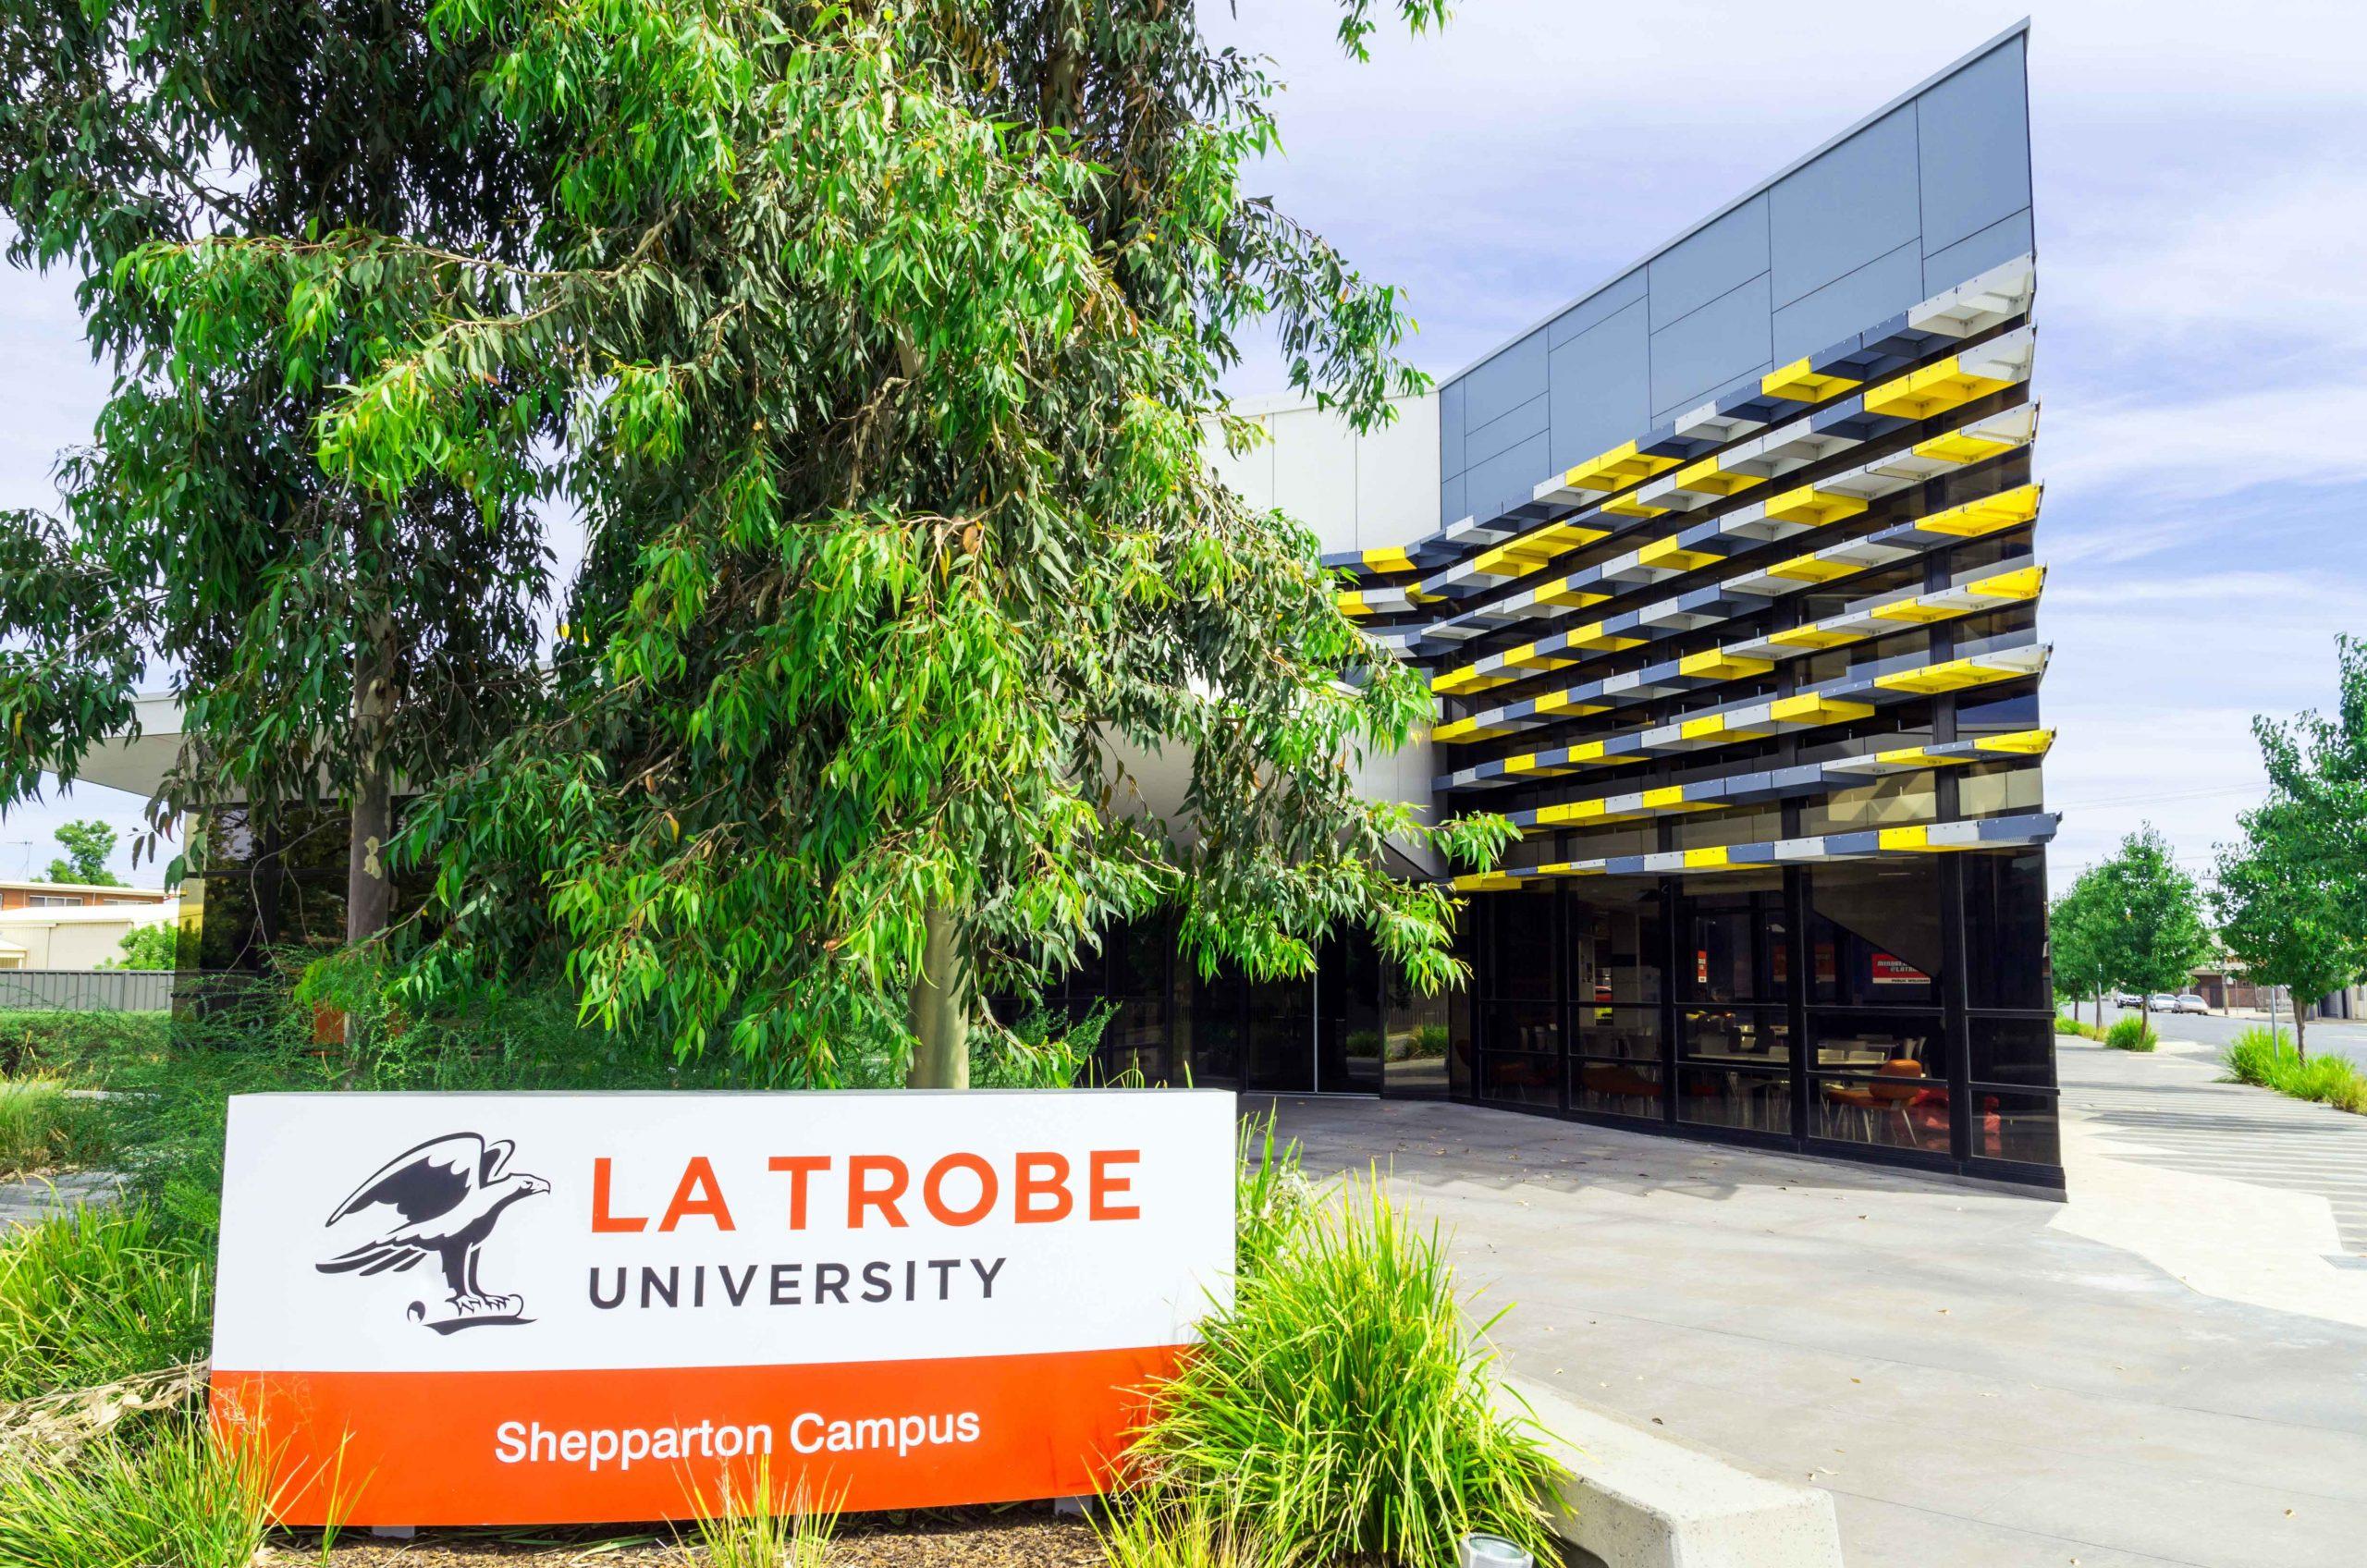 Victoria's La Trobe University switches on massive 2.5MW solar array